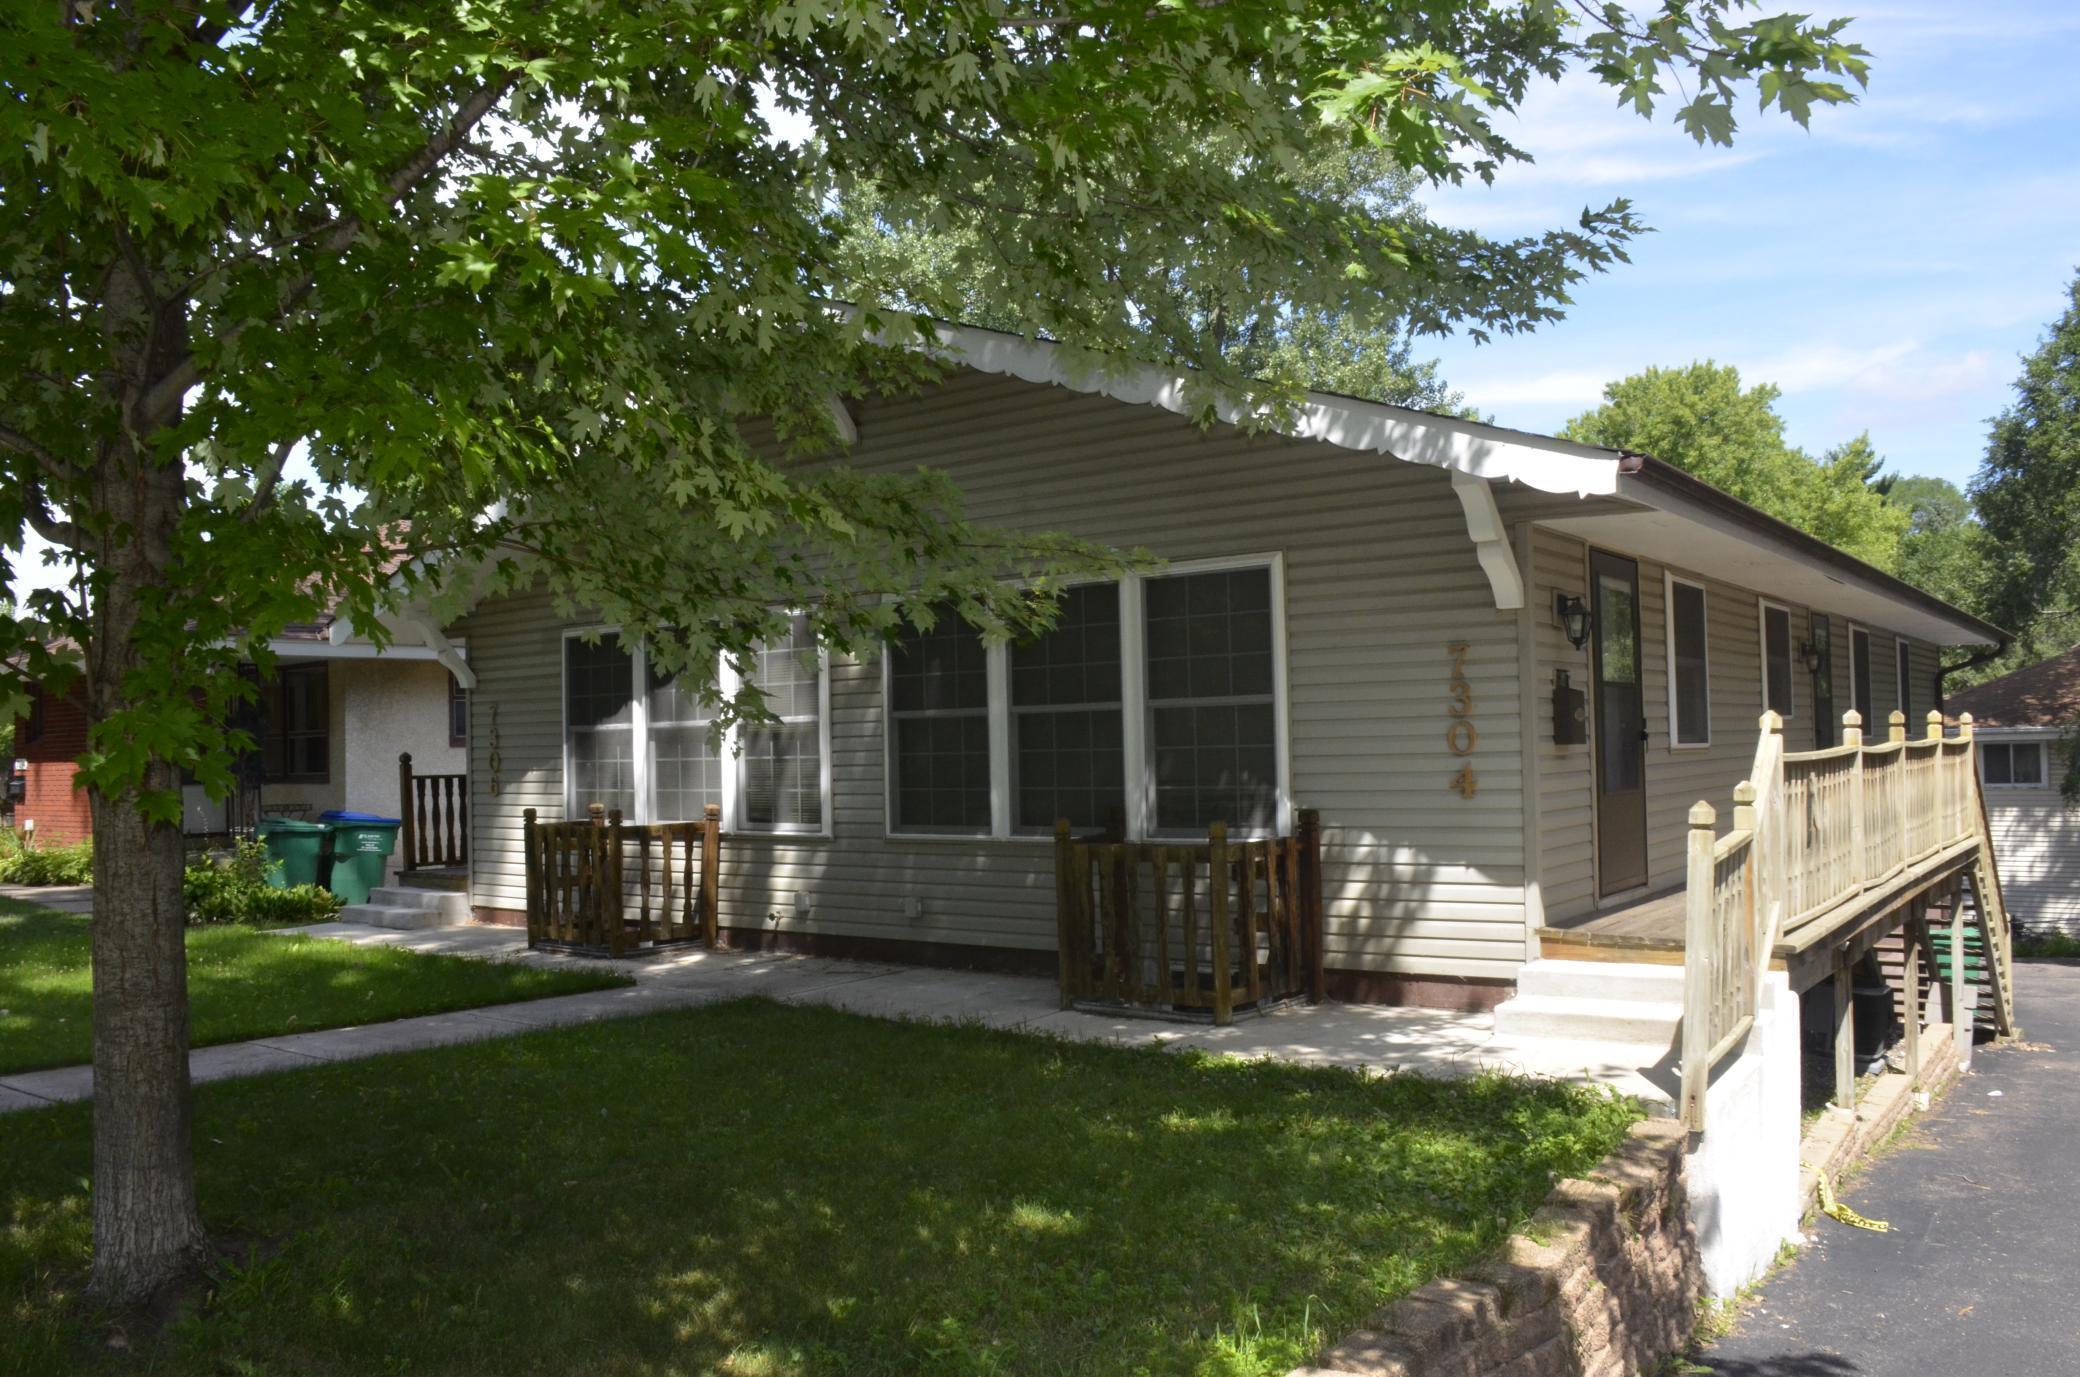 7304/7306 Minnetonka Boulevard Property Photo - Saint Louis Park, MN real estate listing